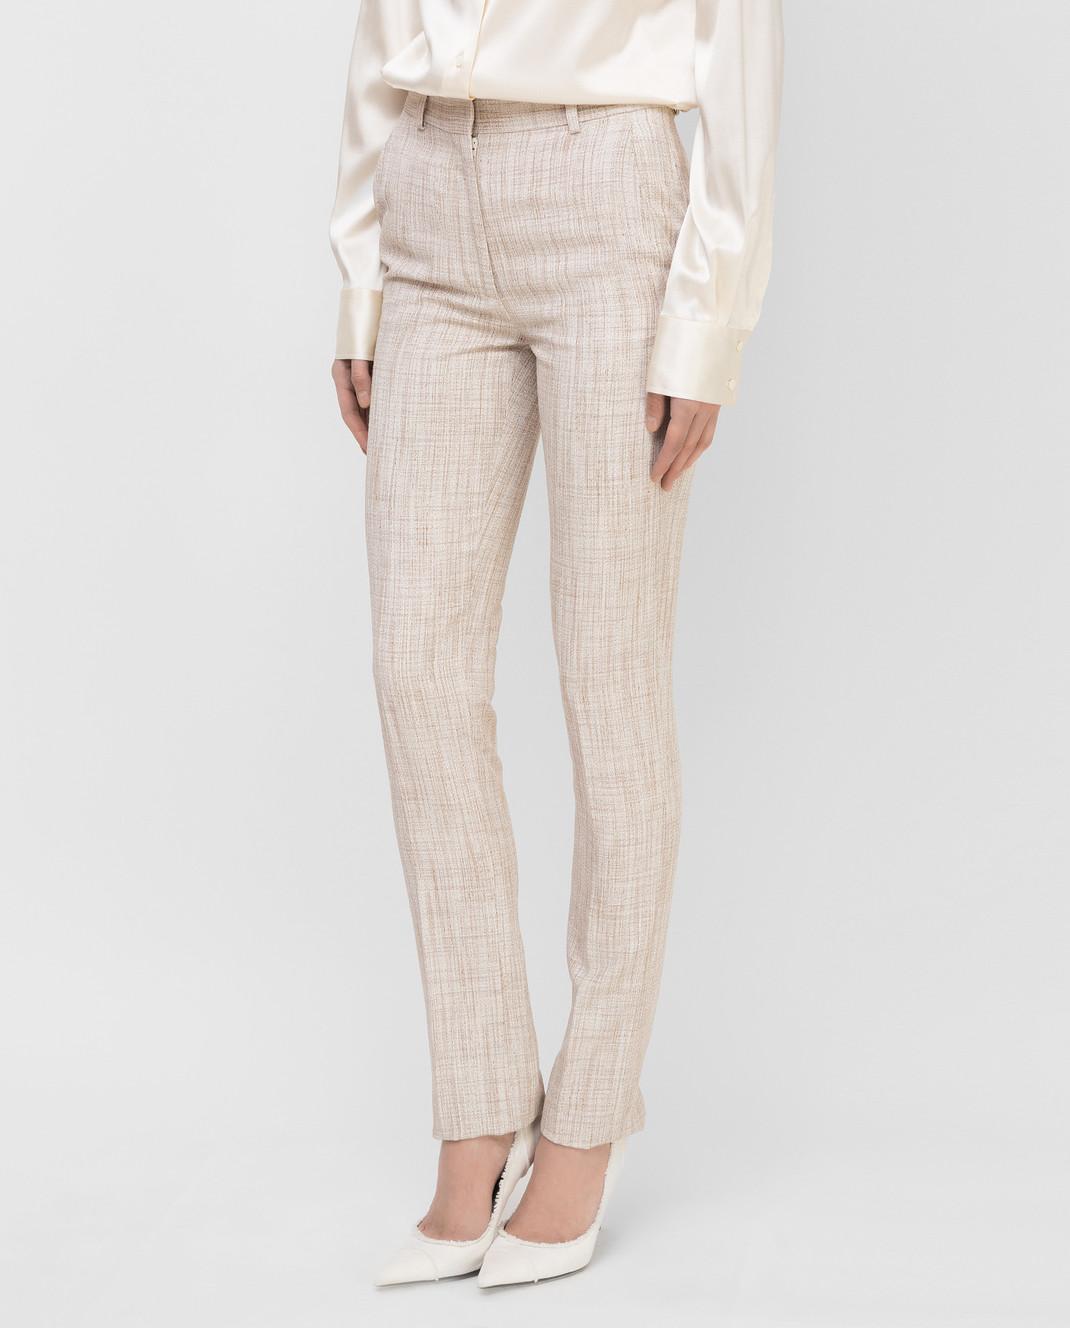 Victoria Beckham Бежевые брюки TRSLM2402 изображение 3